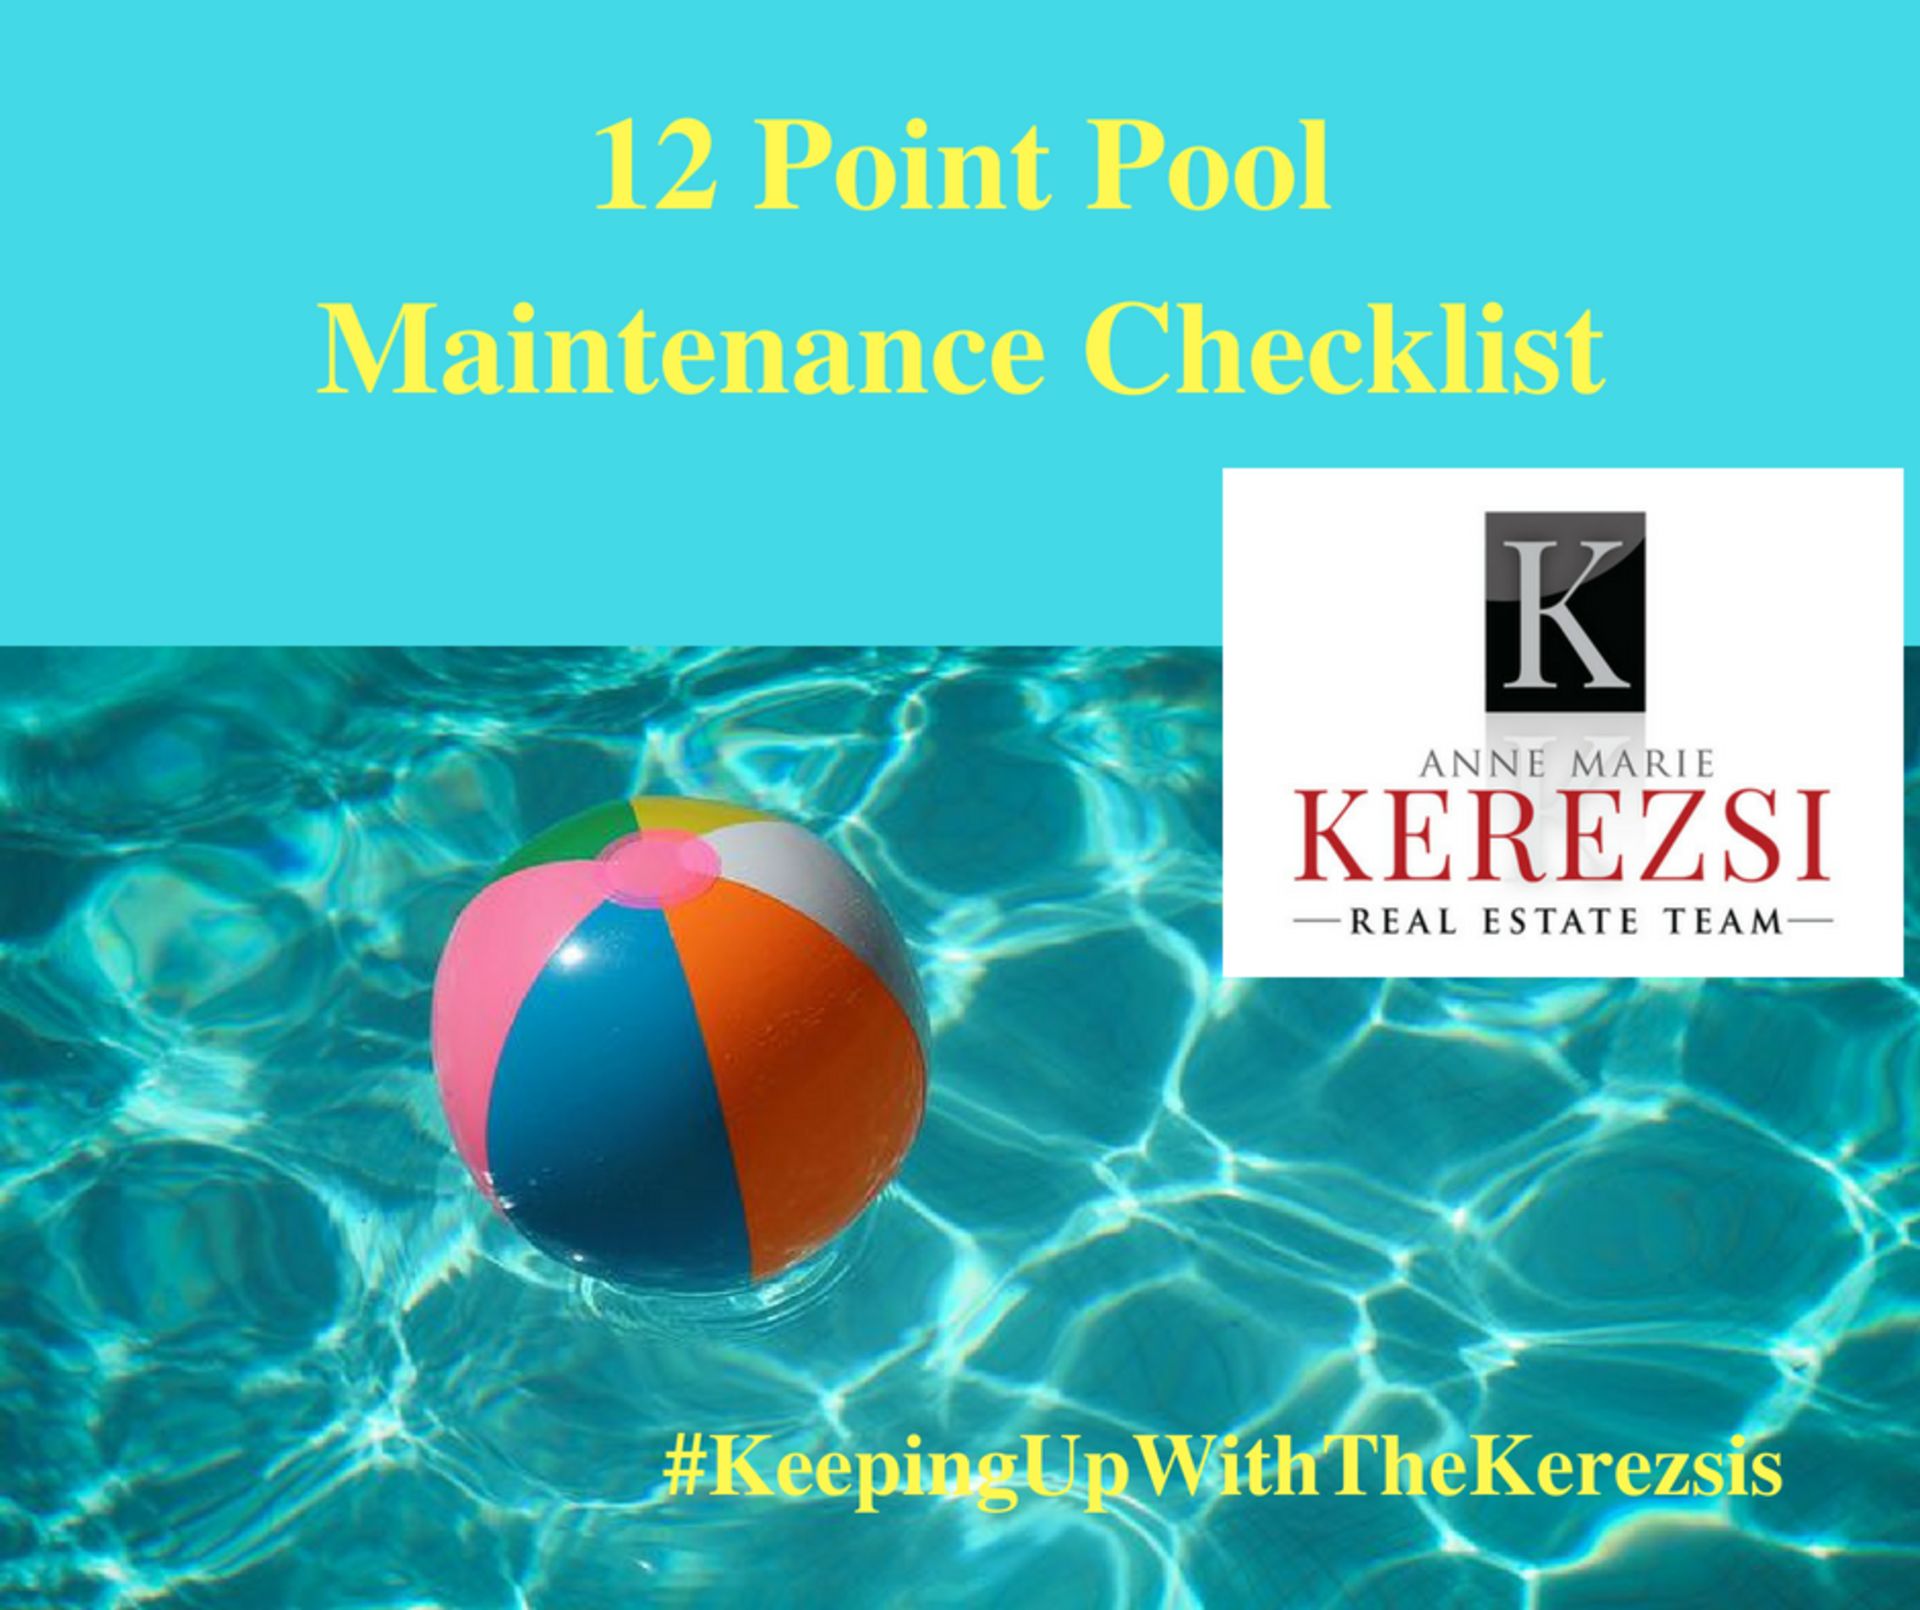 12 Point Pool Maintenance Checklist (from HomeKeepr)